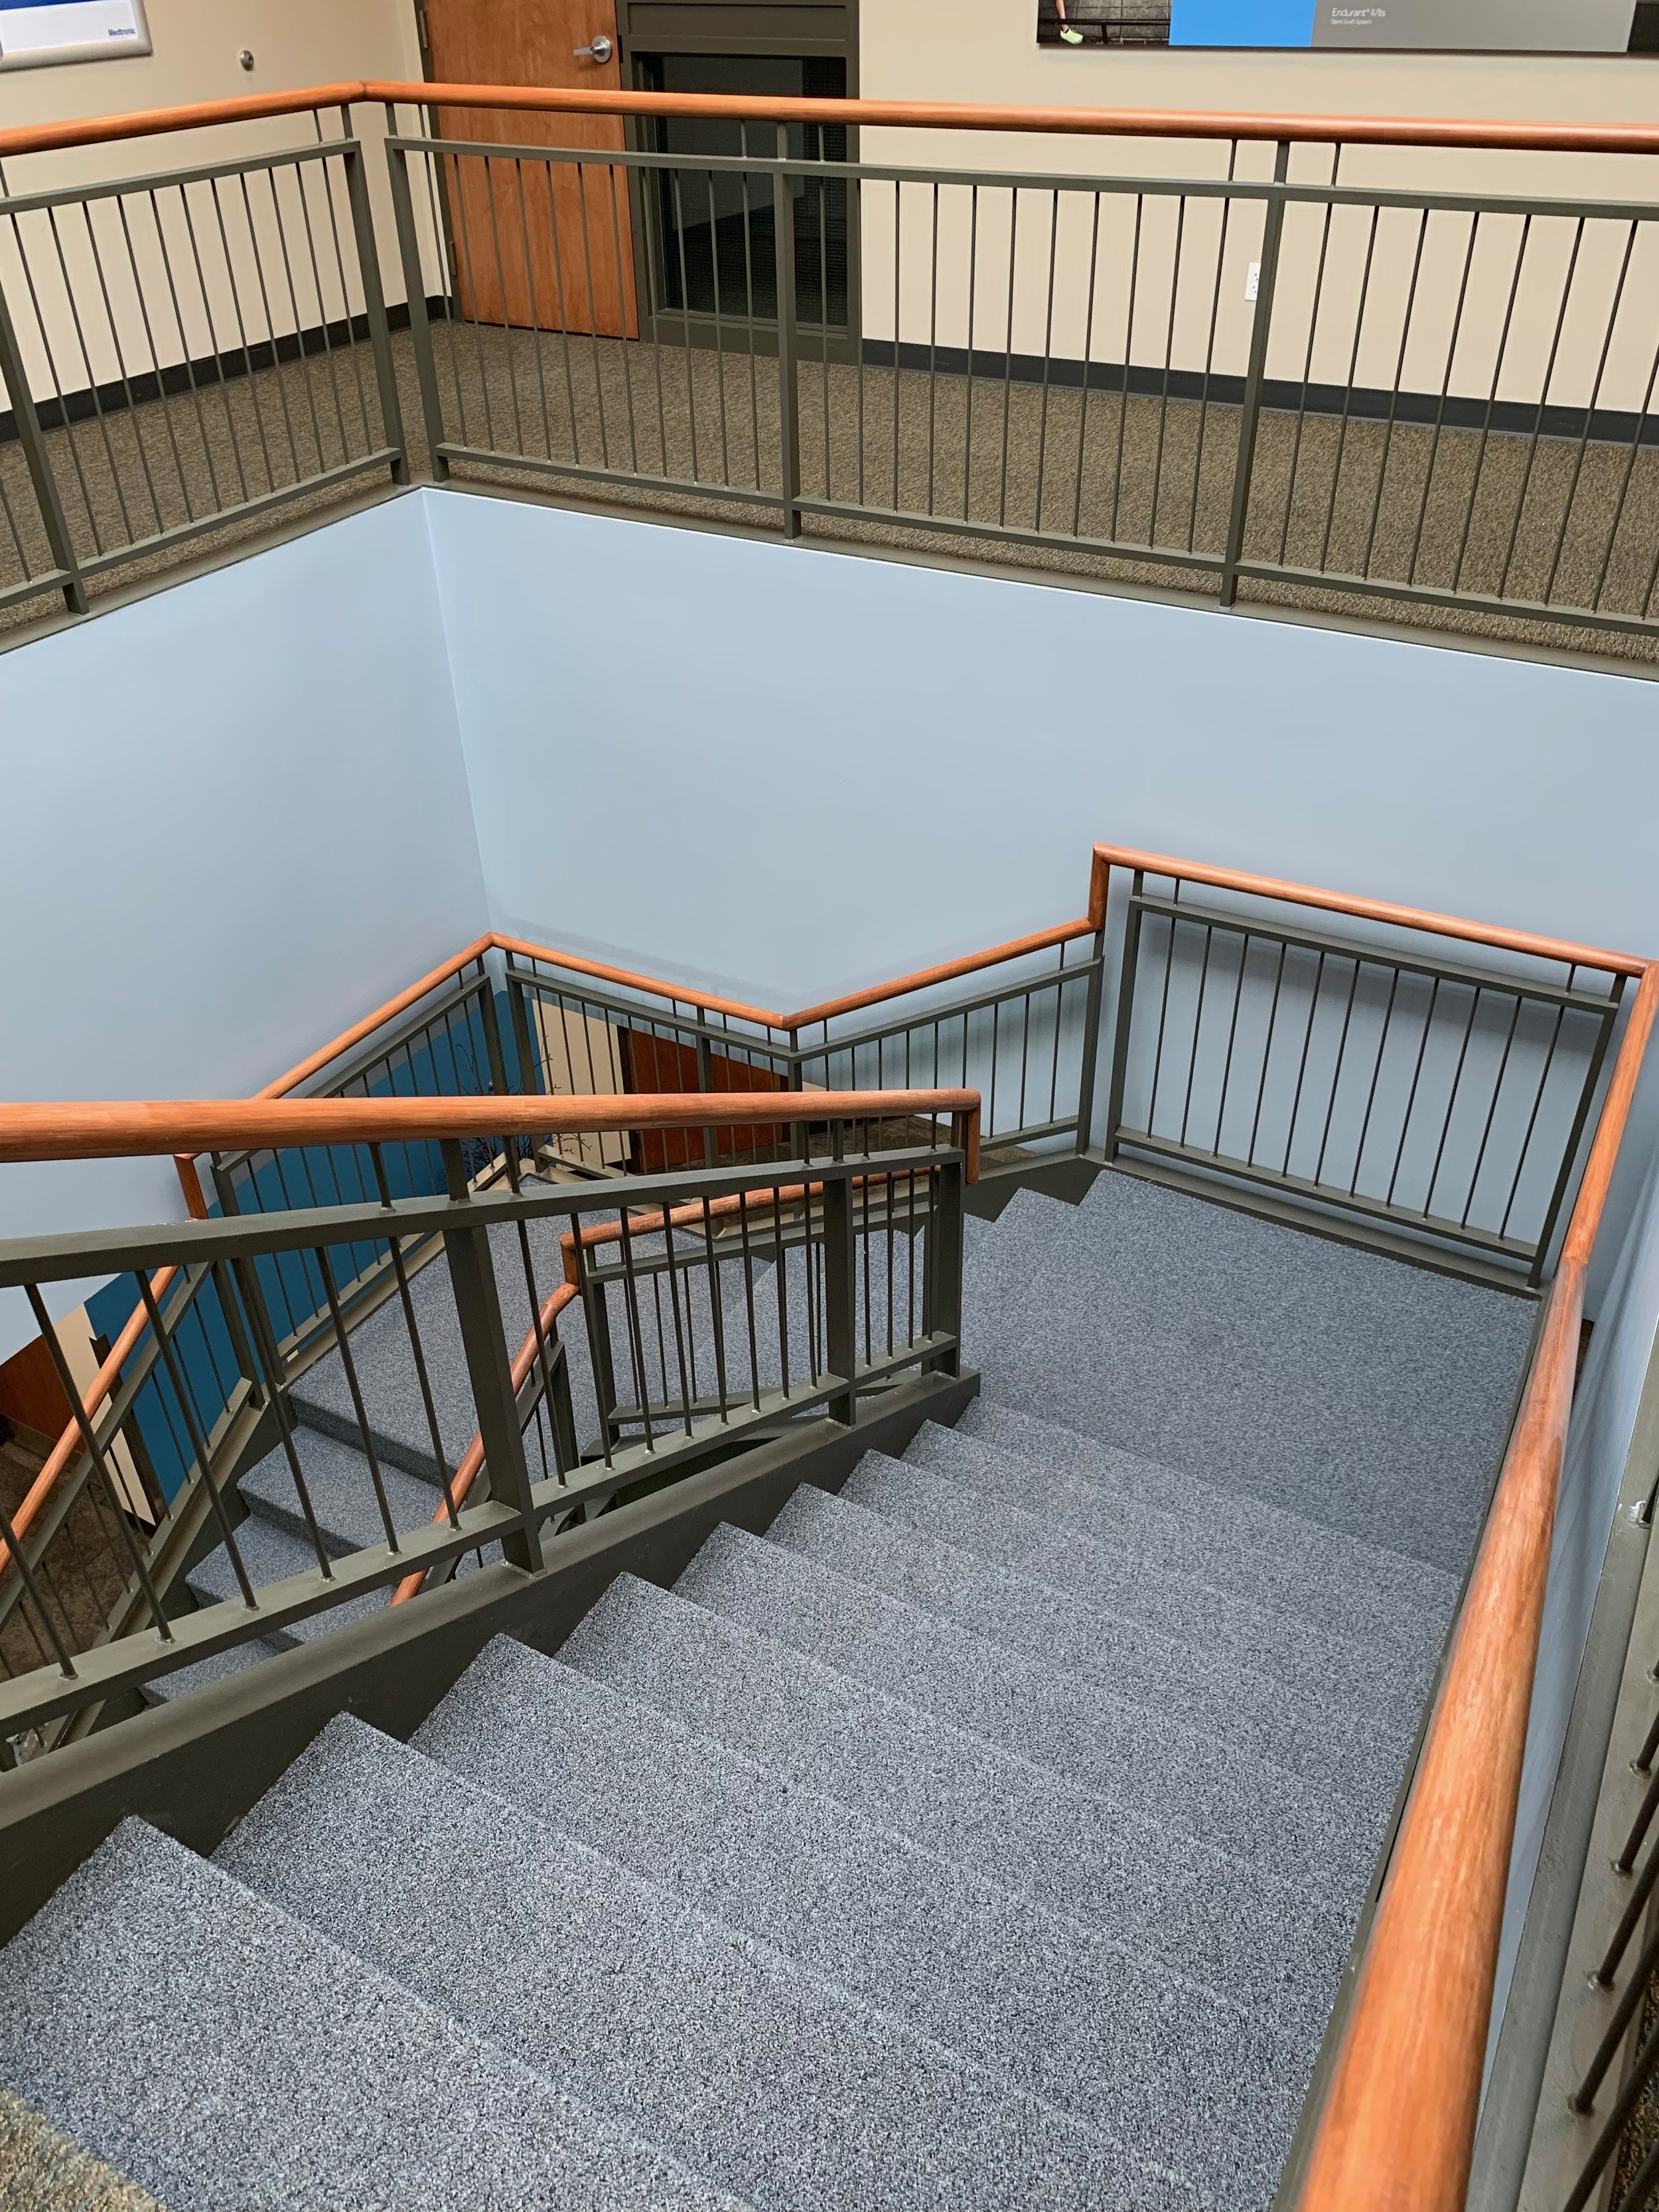 medtronic building threecore stairwell 4-27-19 #3.JPG